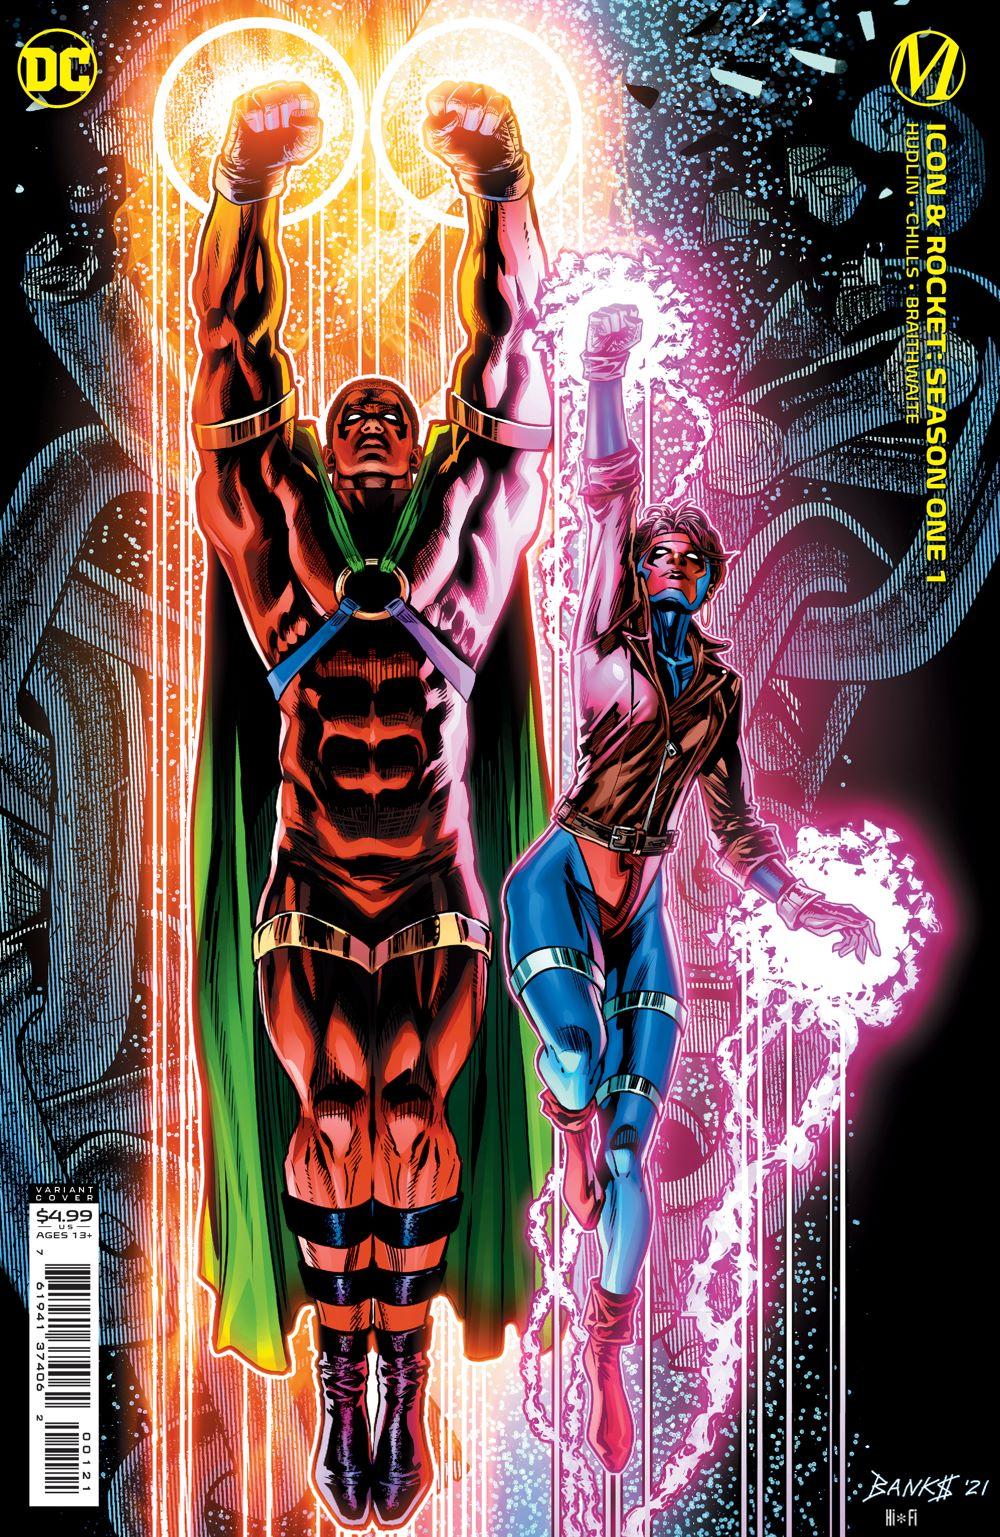 ICON_ROCKET_Cv1_Var DC Comics July 2021 Solicitations